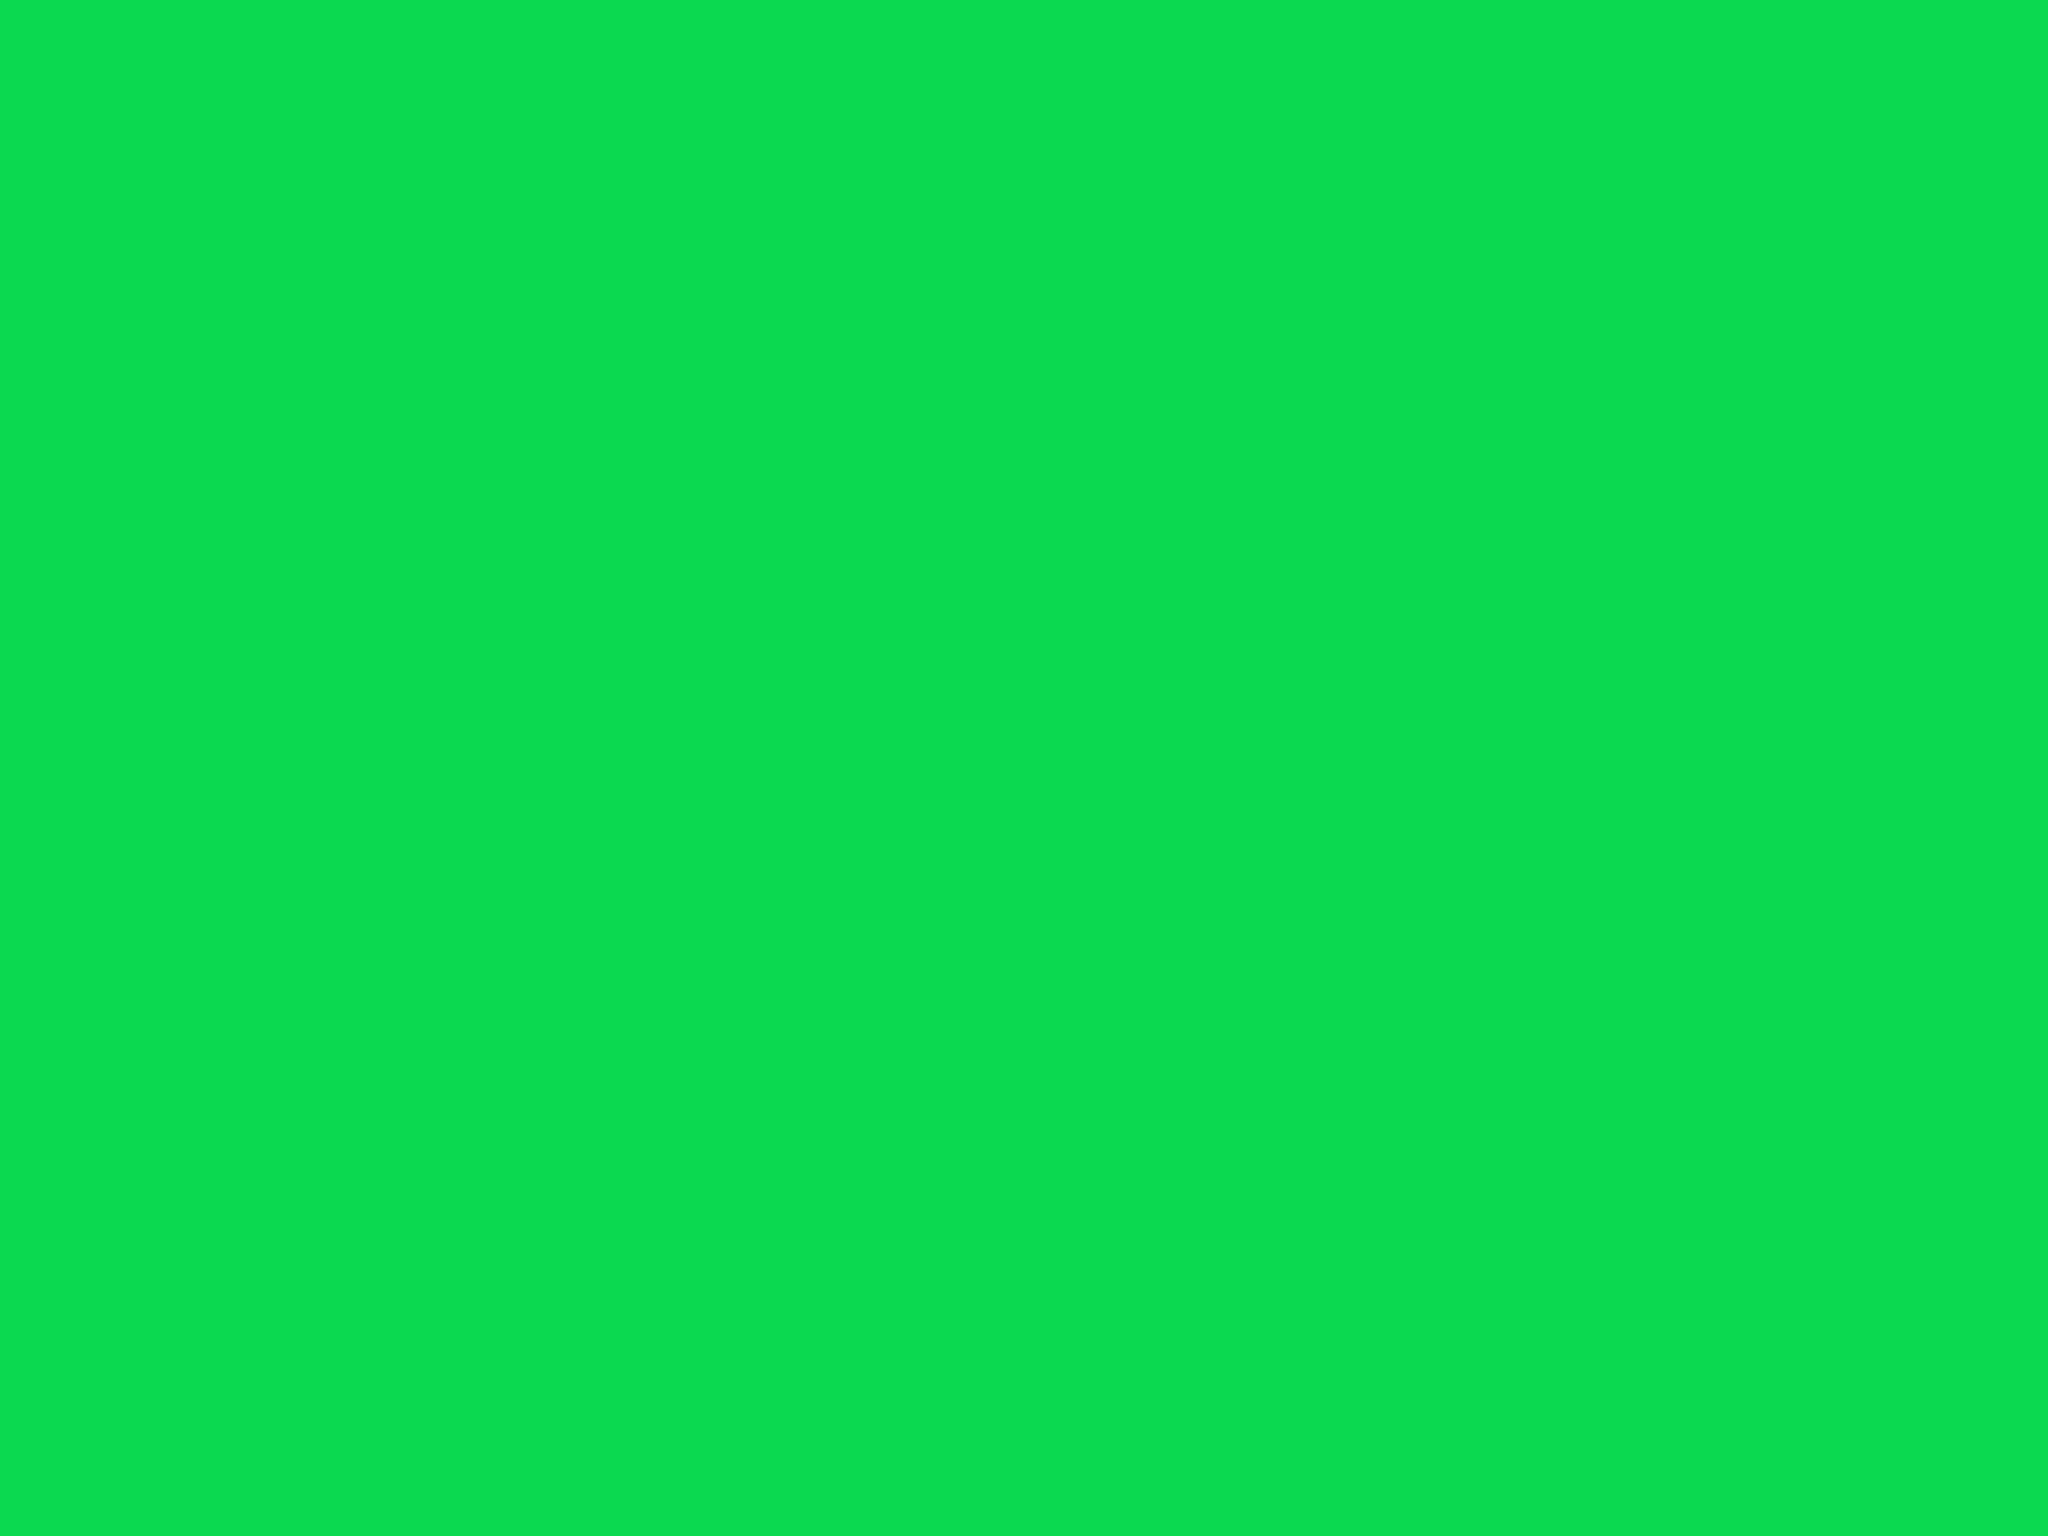 2048x1536 Malachite Solid Color Background